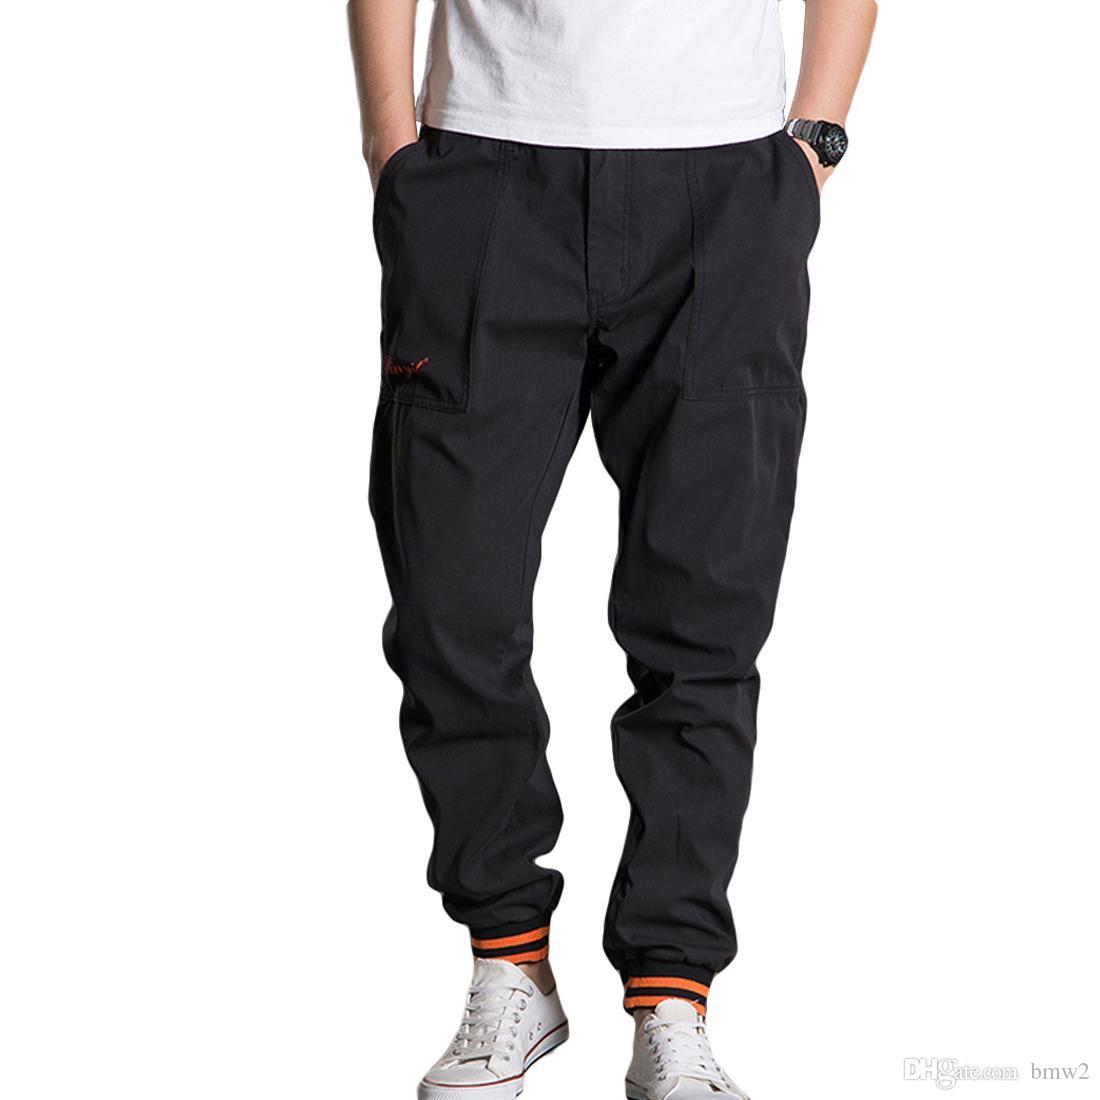 03cde0b9e80 2019 L 5XL Casual Cargo Pants Men Plus Size Baggy Harem Pants 2017 Fashion  Solid Kpop Trousers Mens Elastic Waist Jogger Sweatpants From Bmw2